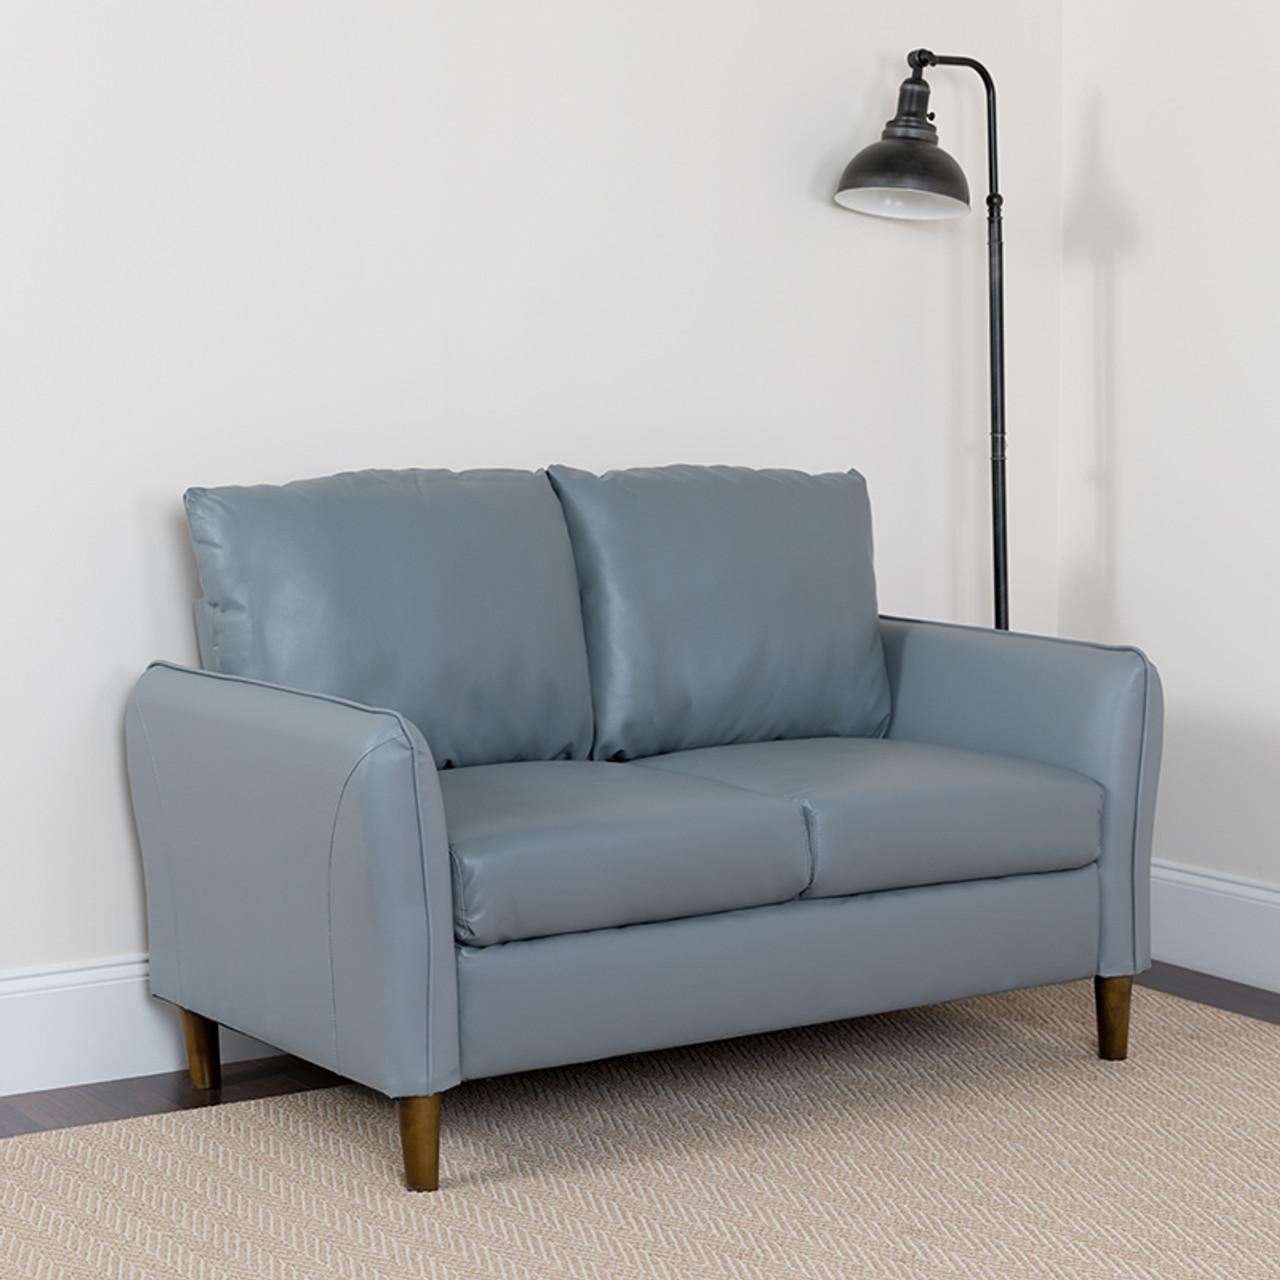 Picture of: Flash Furniture Milton Park Plush Gray Leather Pillow Back Loveseat